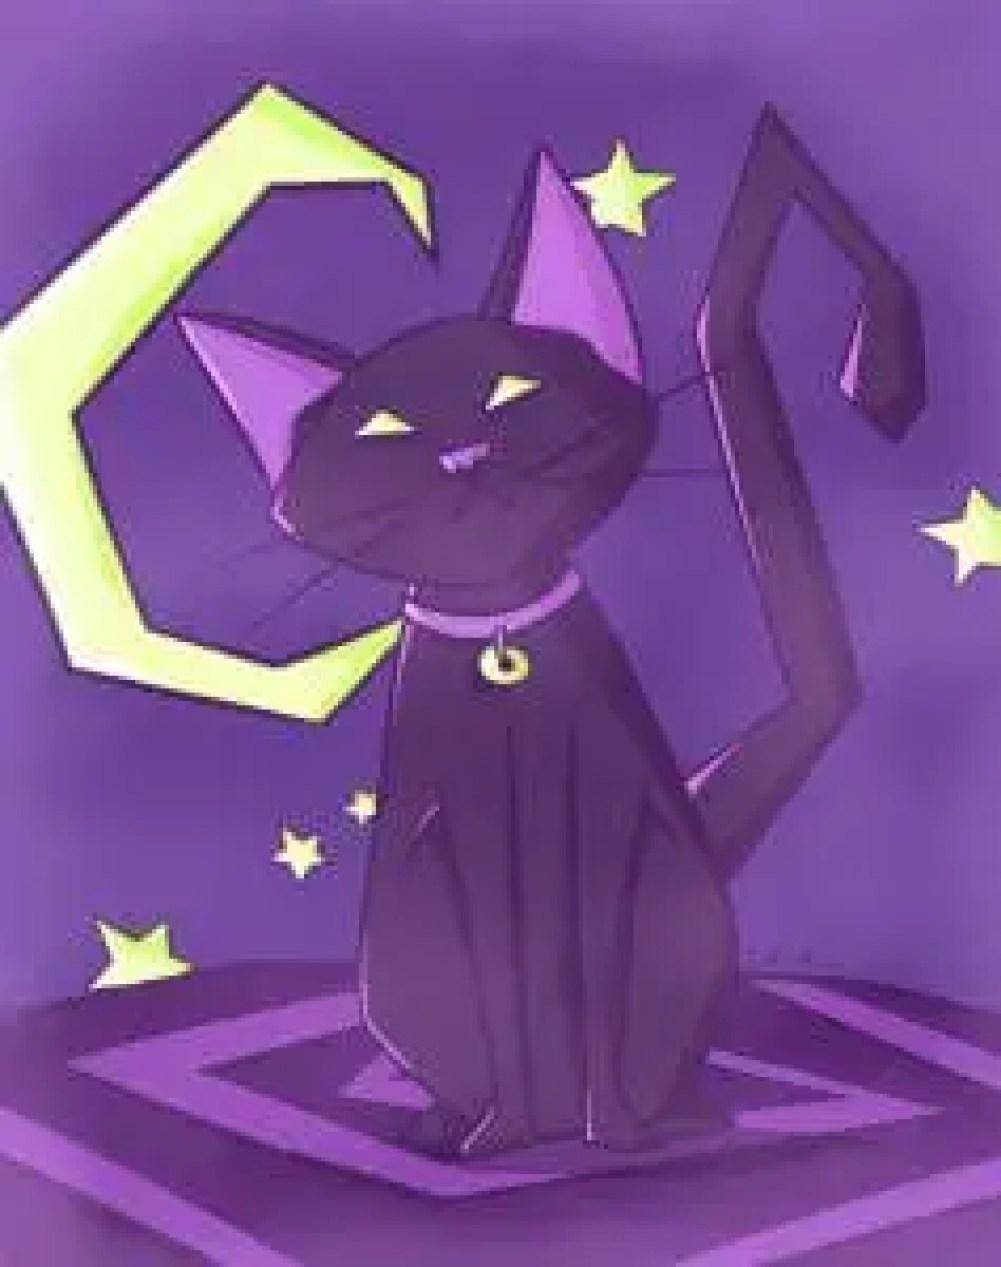 black cat, illustration, artwork, national cat day